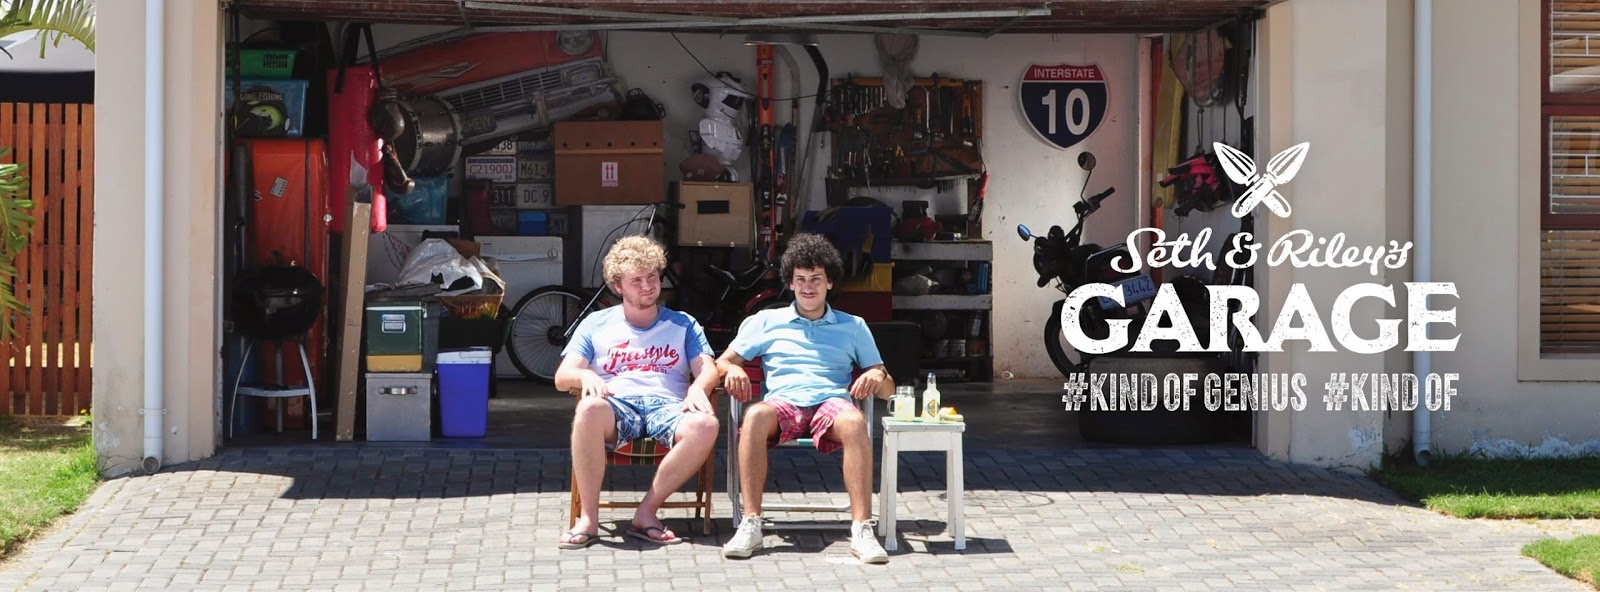 Seth & Riley's Garage: Kind of genius. Kind of.